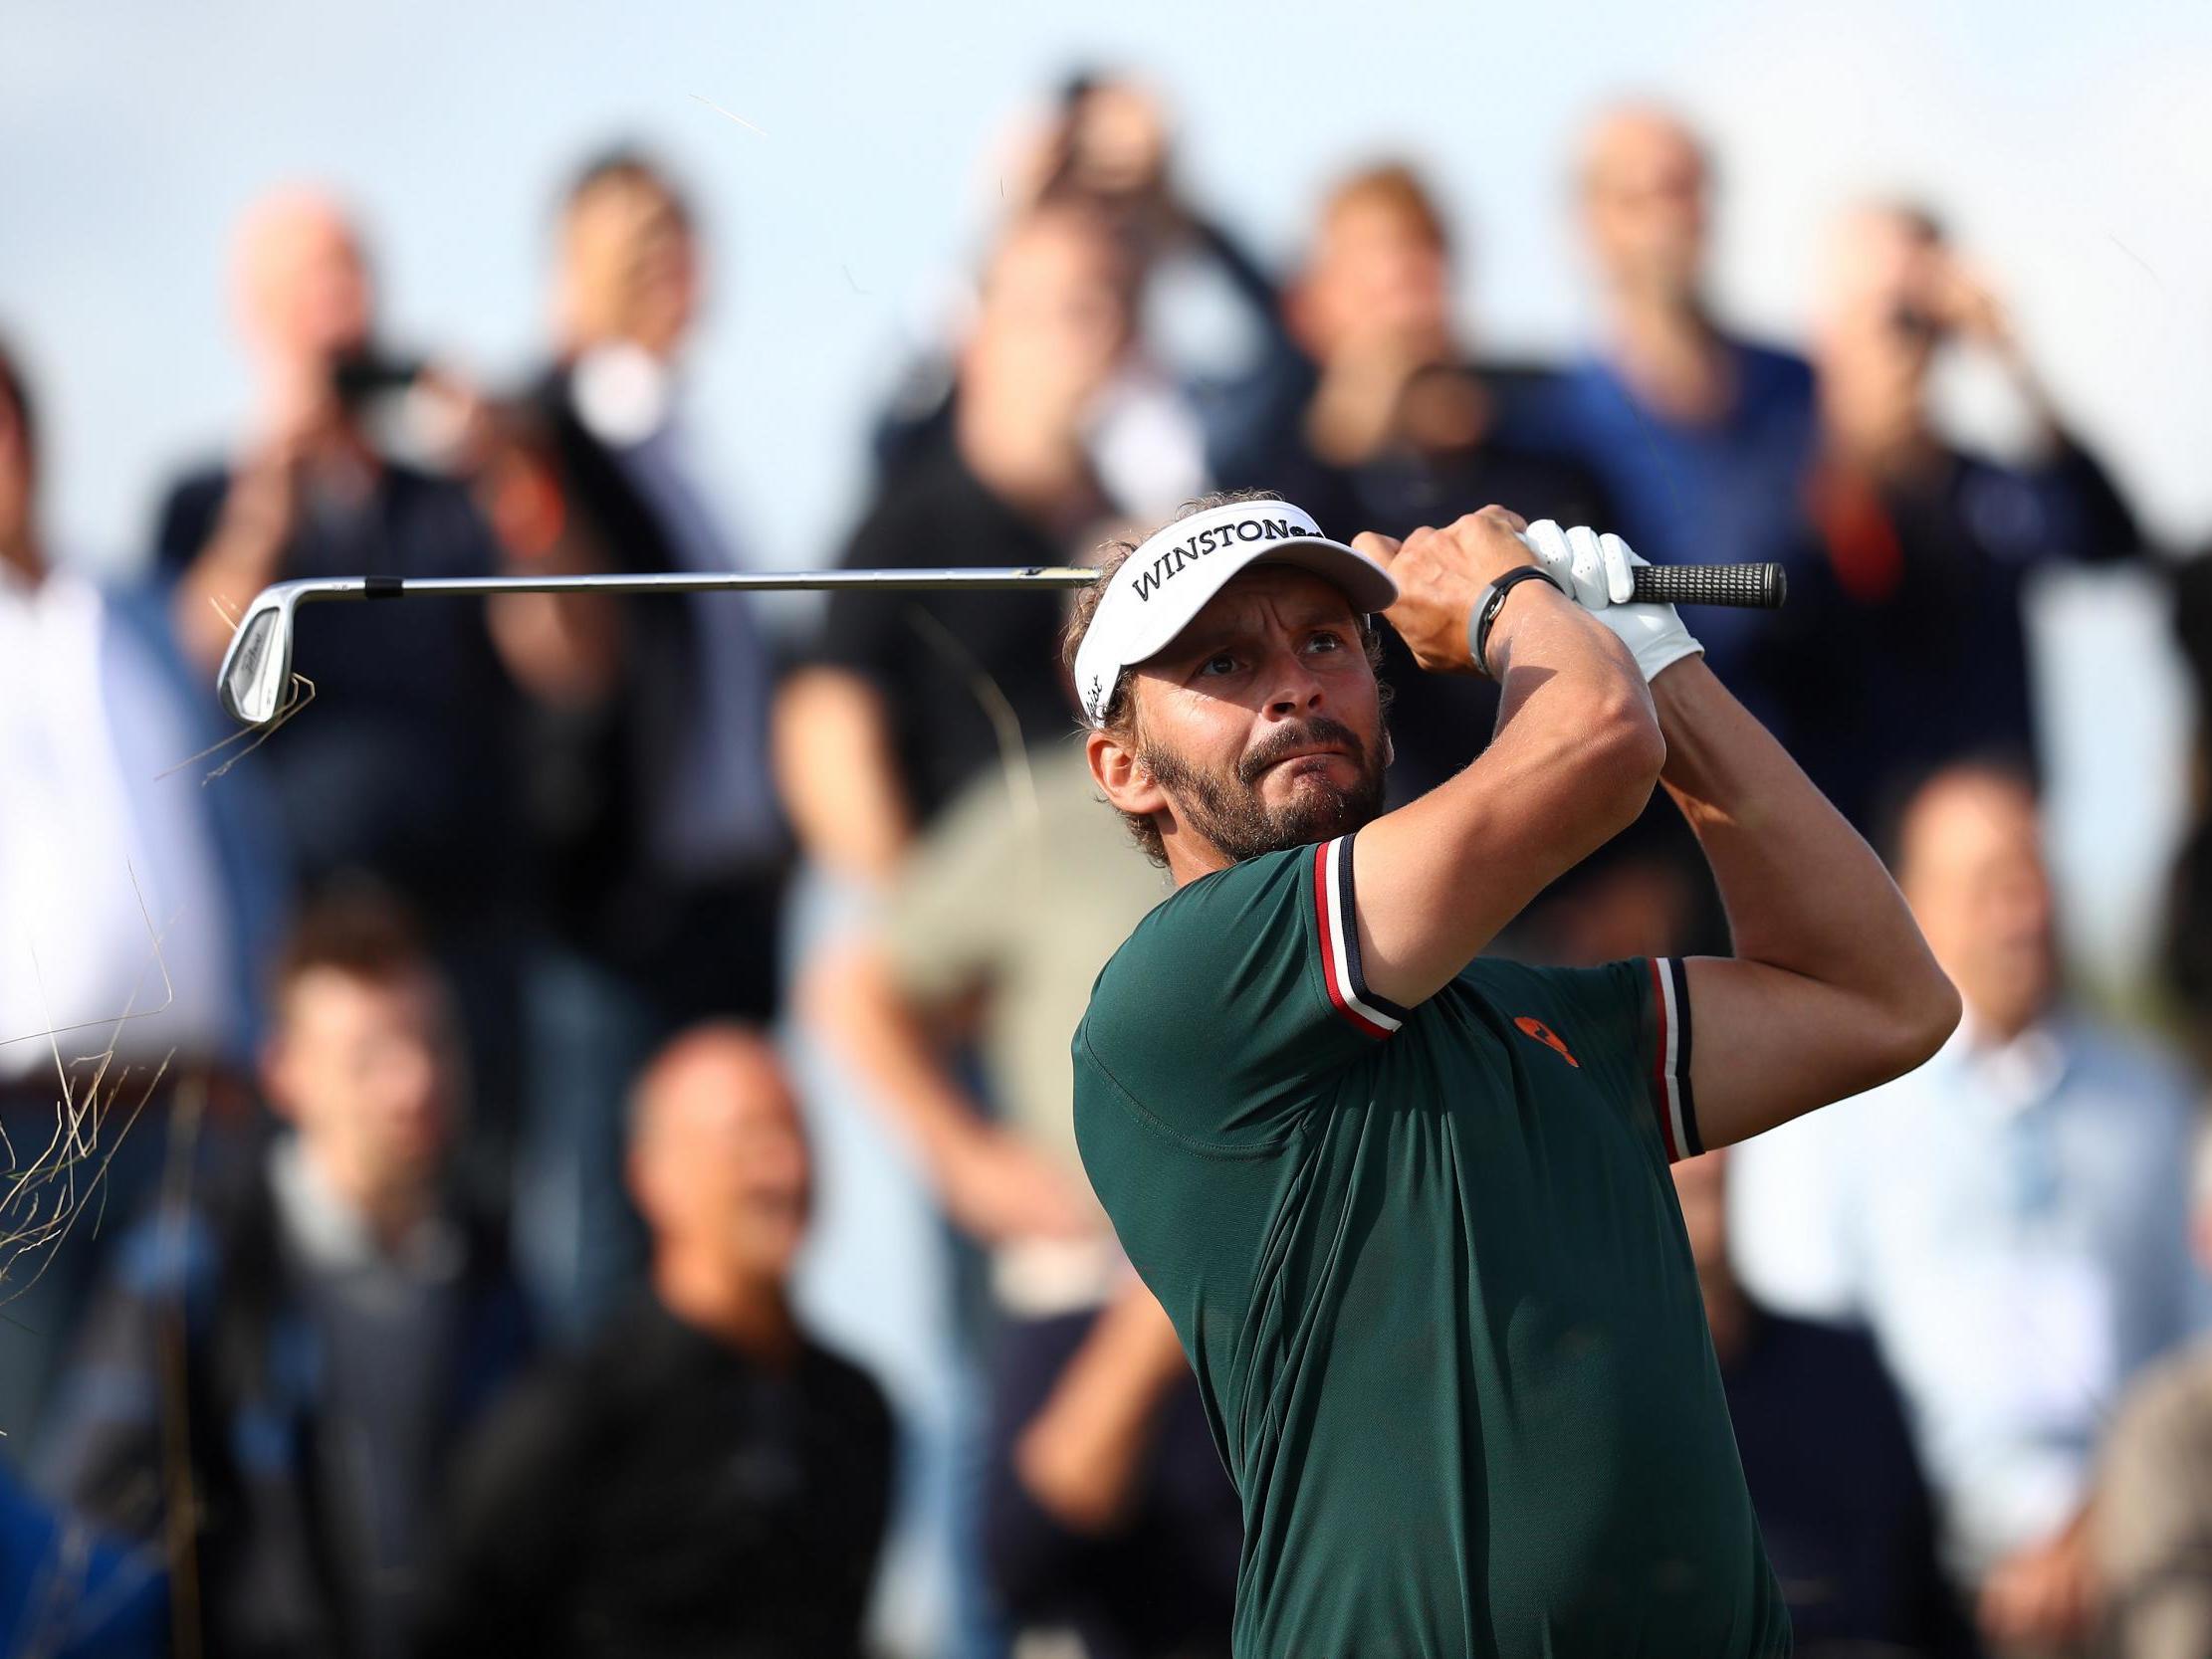 European Tour player Joost Luiten criticises 'unfair' world golf rankings | The Independent